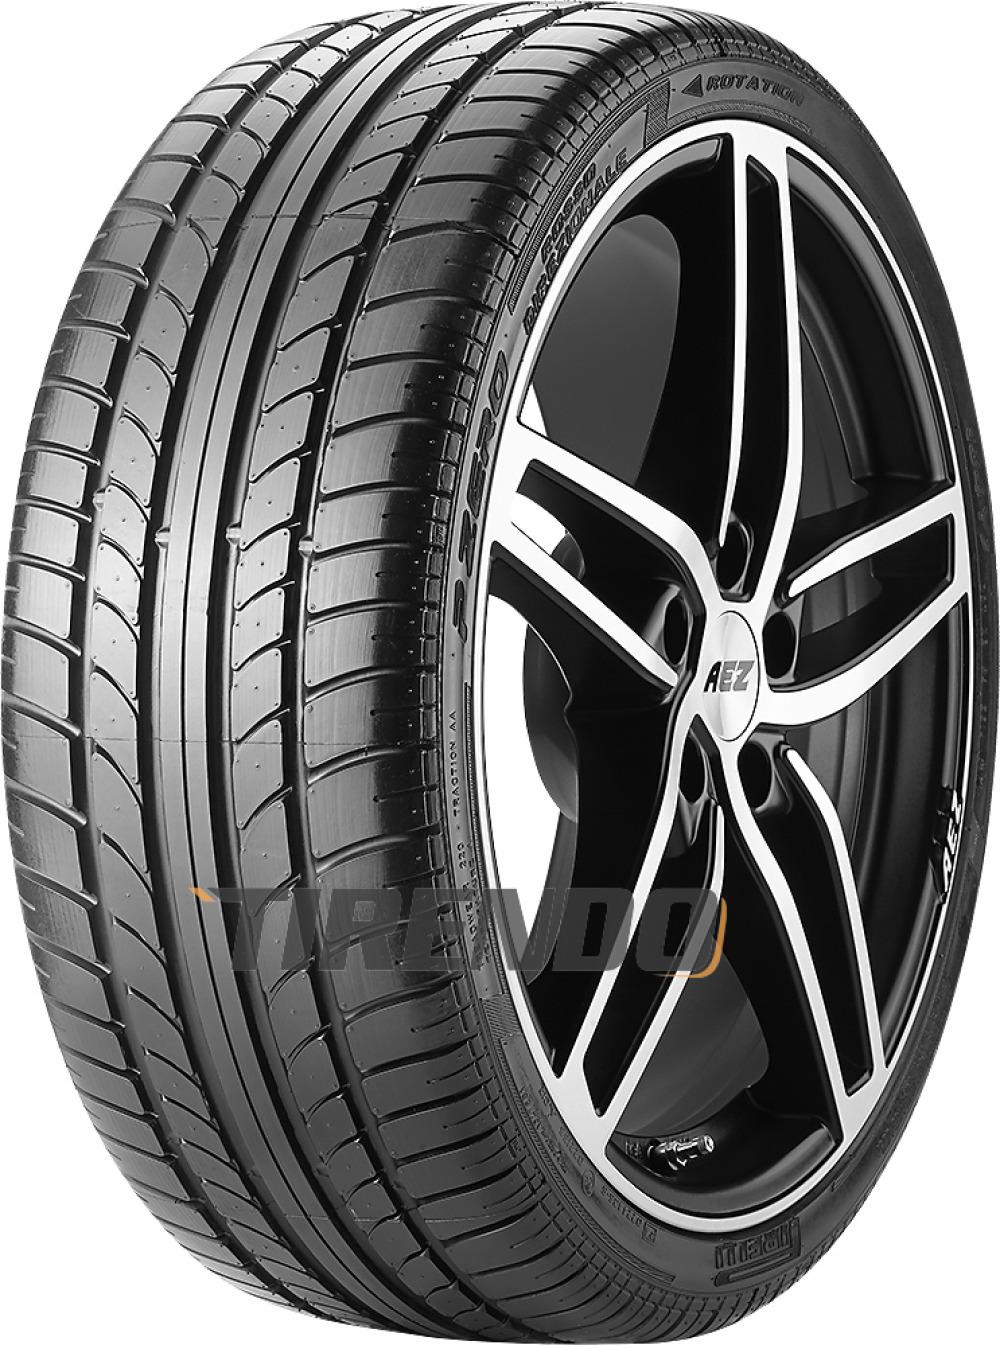 Pirelli P Zero Corsa Direzionale ( 255/35 ZR20 (97Y) XL AMP )